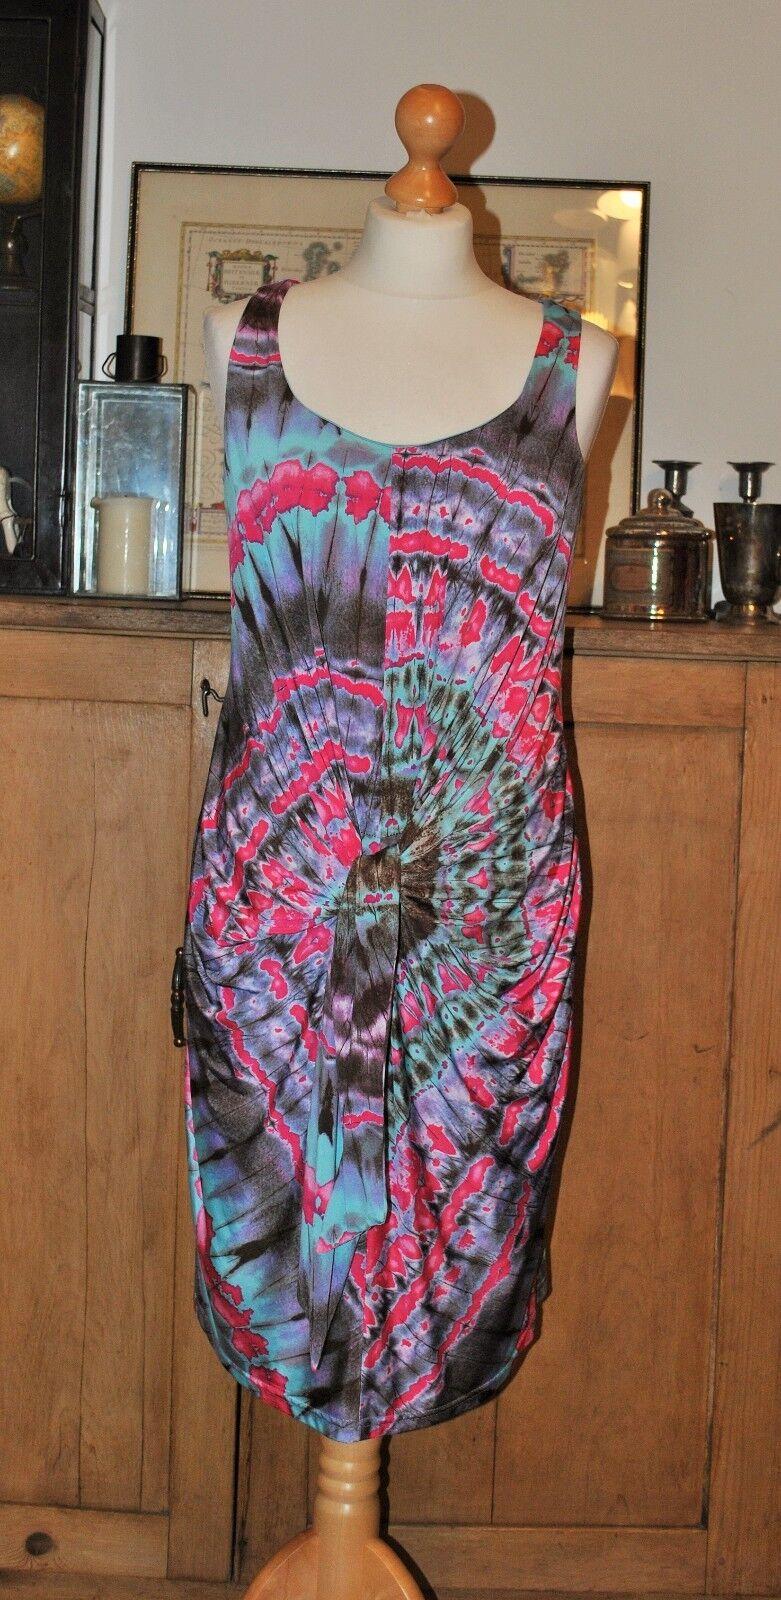 LADIES DESIGNER JOSEPH RIBKOFF MULTI COLOUR DRESS Größe UK10